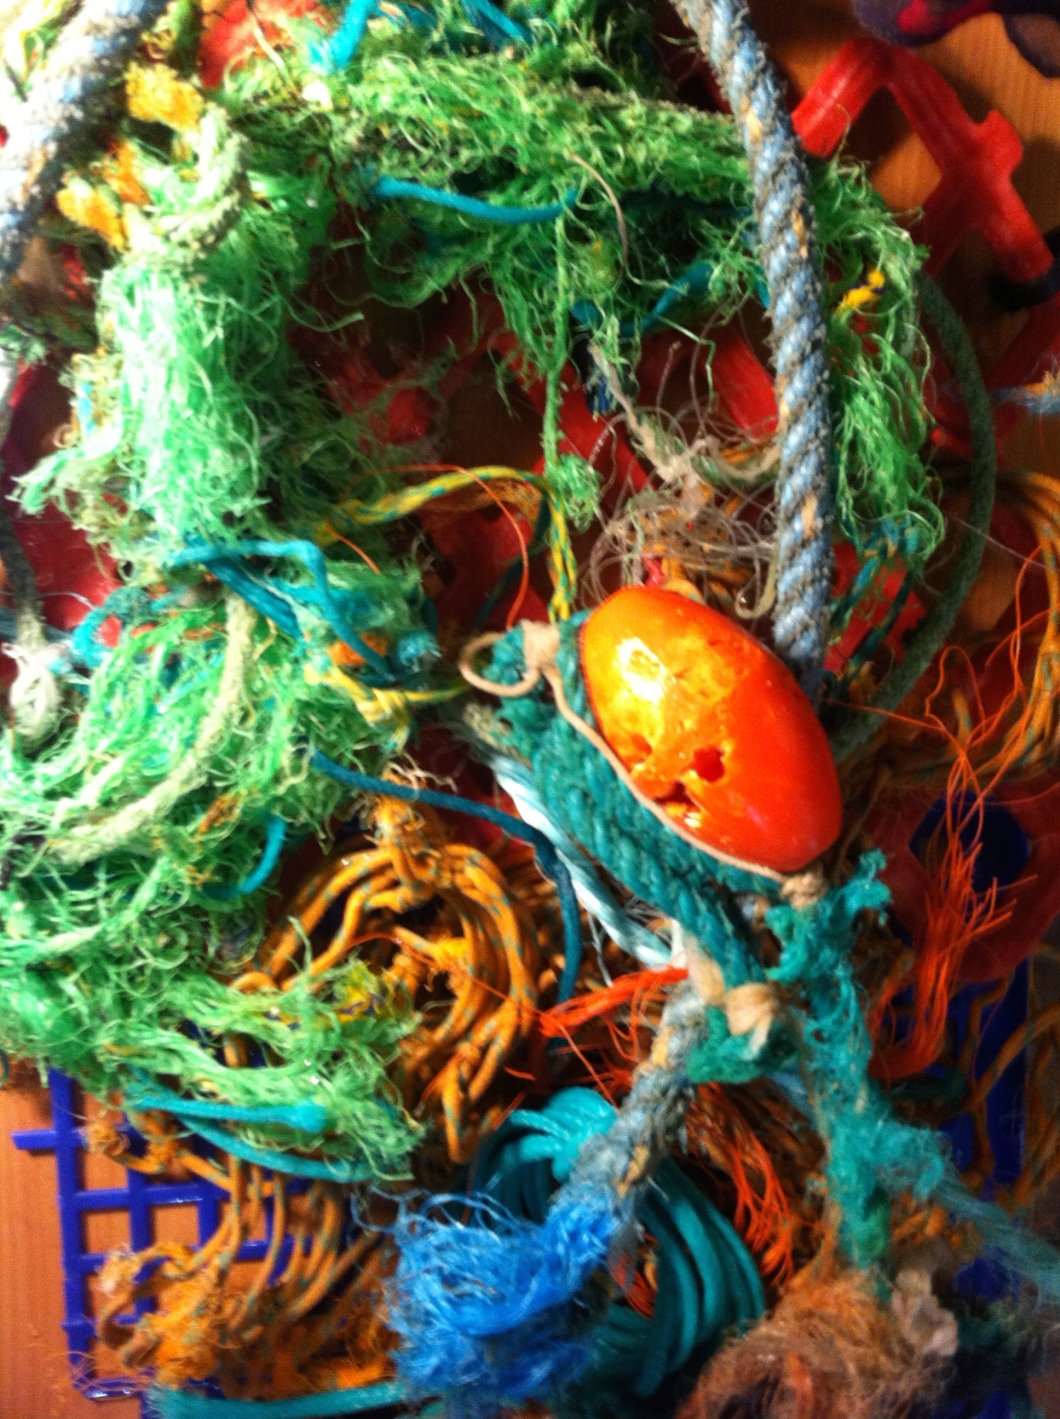 Beach plastics found in Cornwall